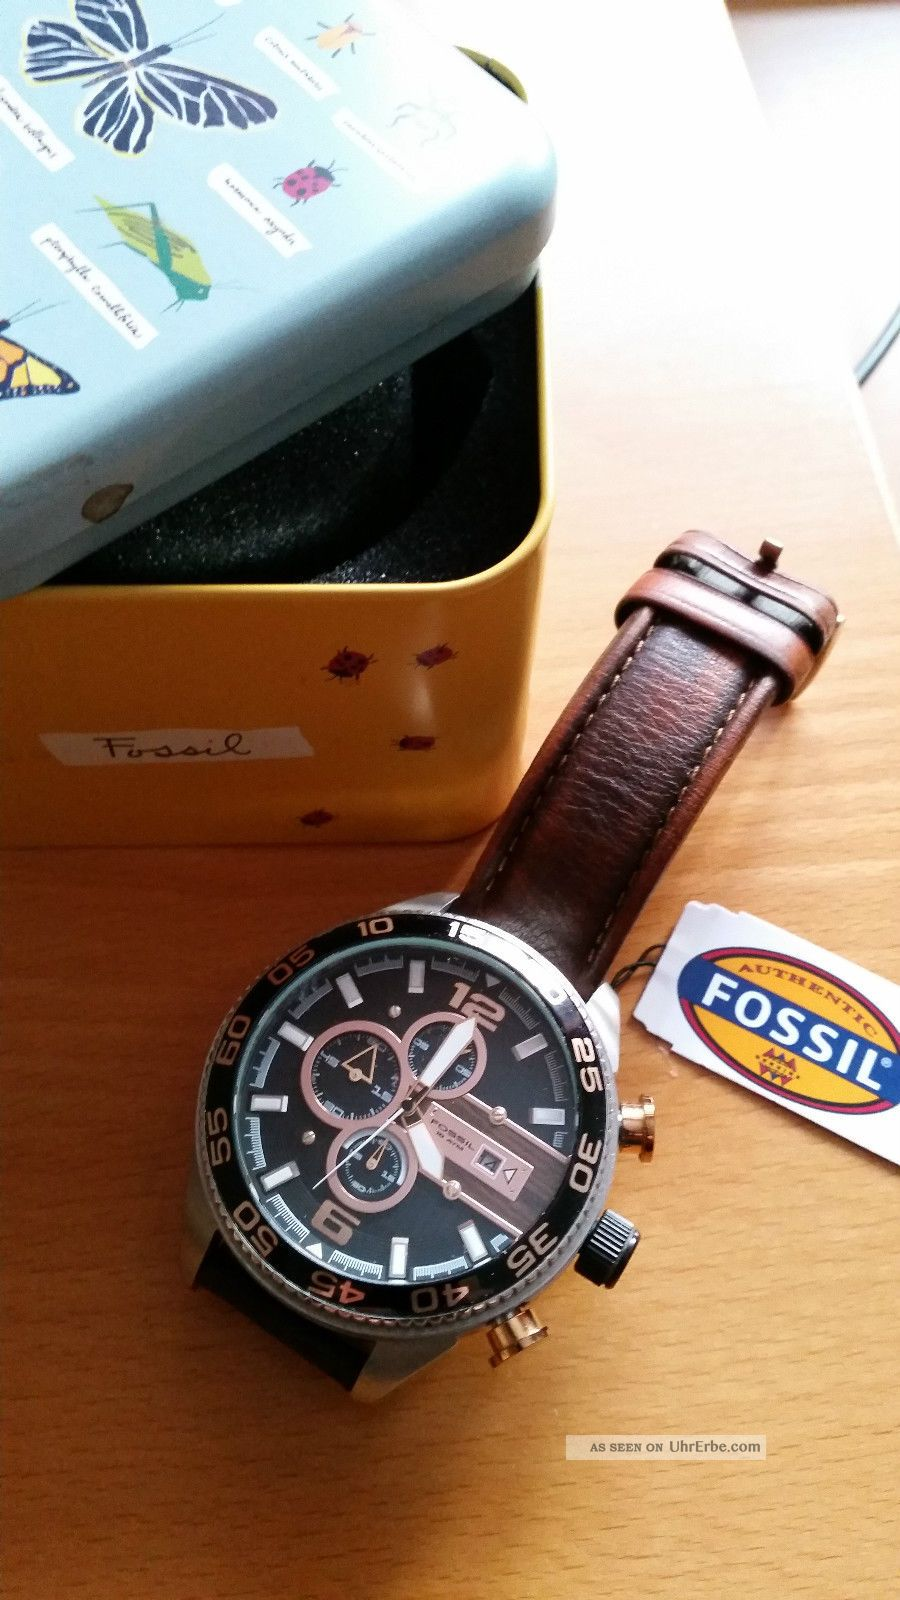 Chronograph Fossil Ch 2559 Armbanduhr Für Herren - Top - Mit Ovp Armbanduhren Bild